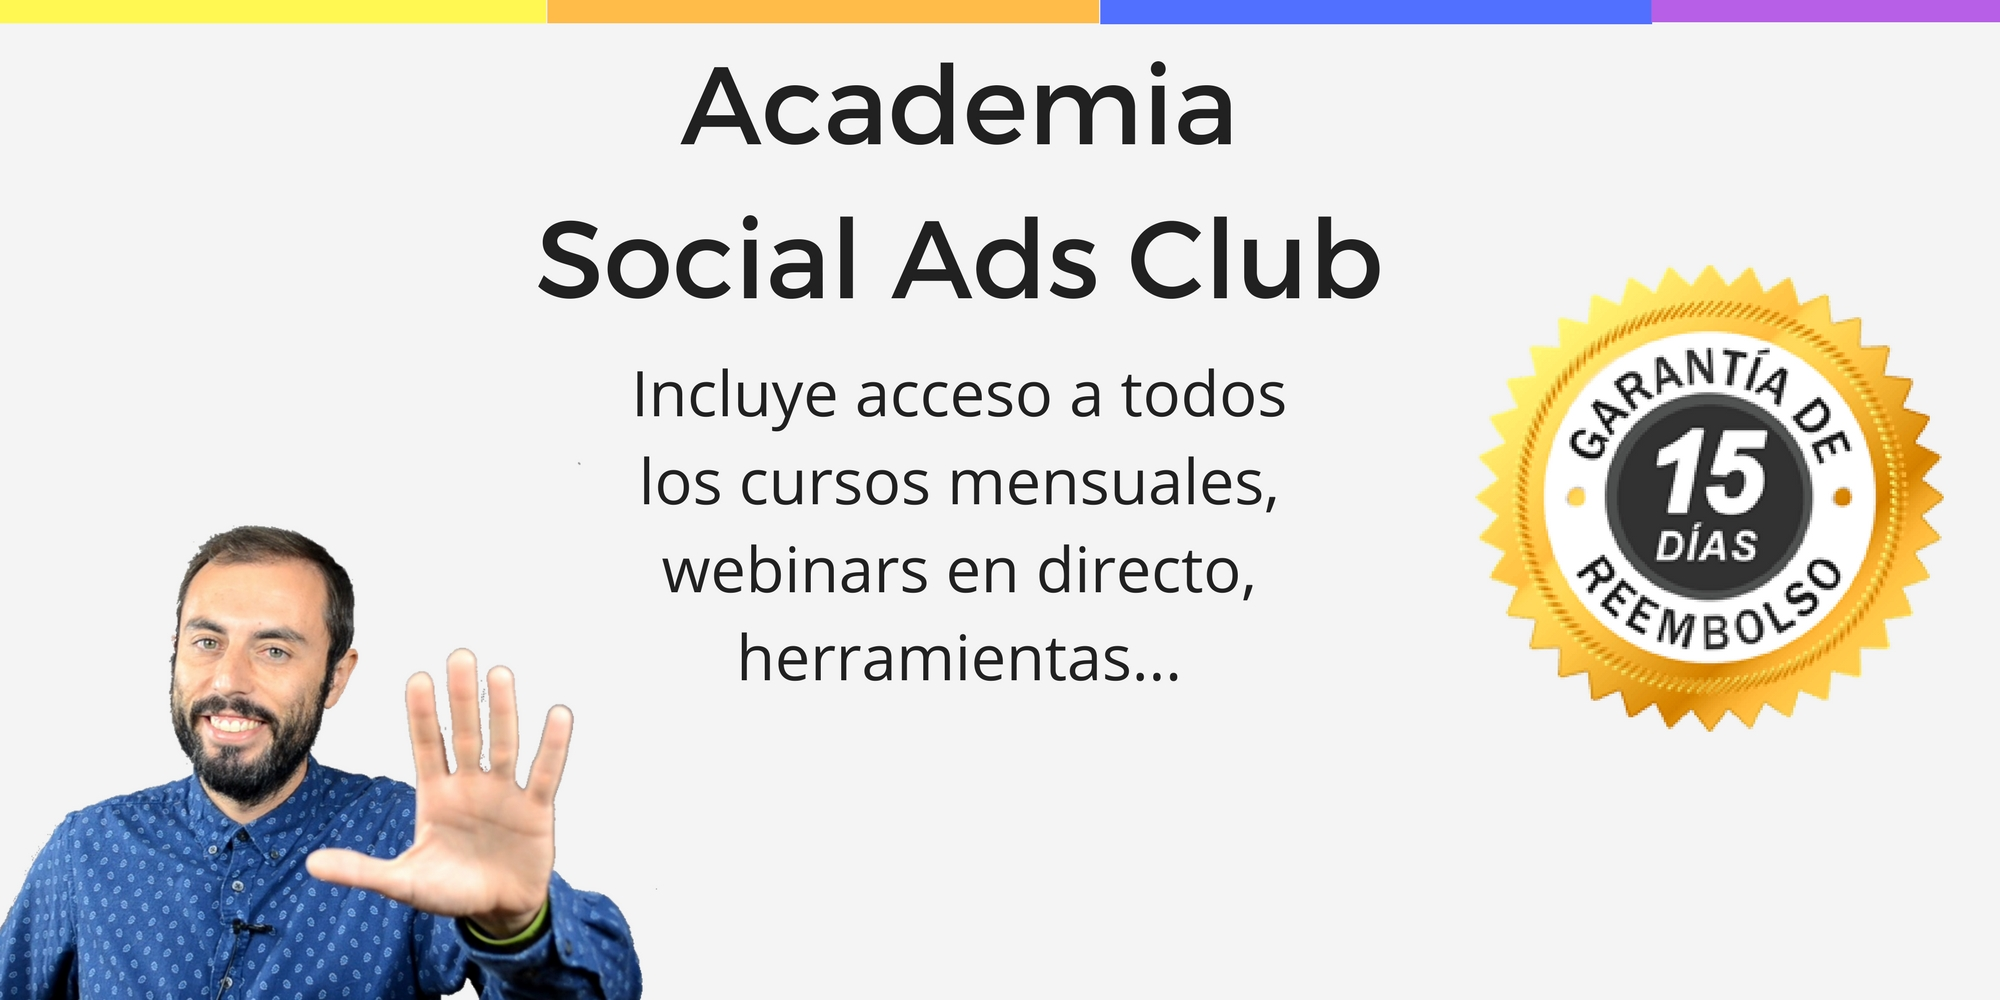 Academia Social Ads Club(1)